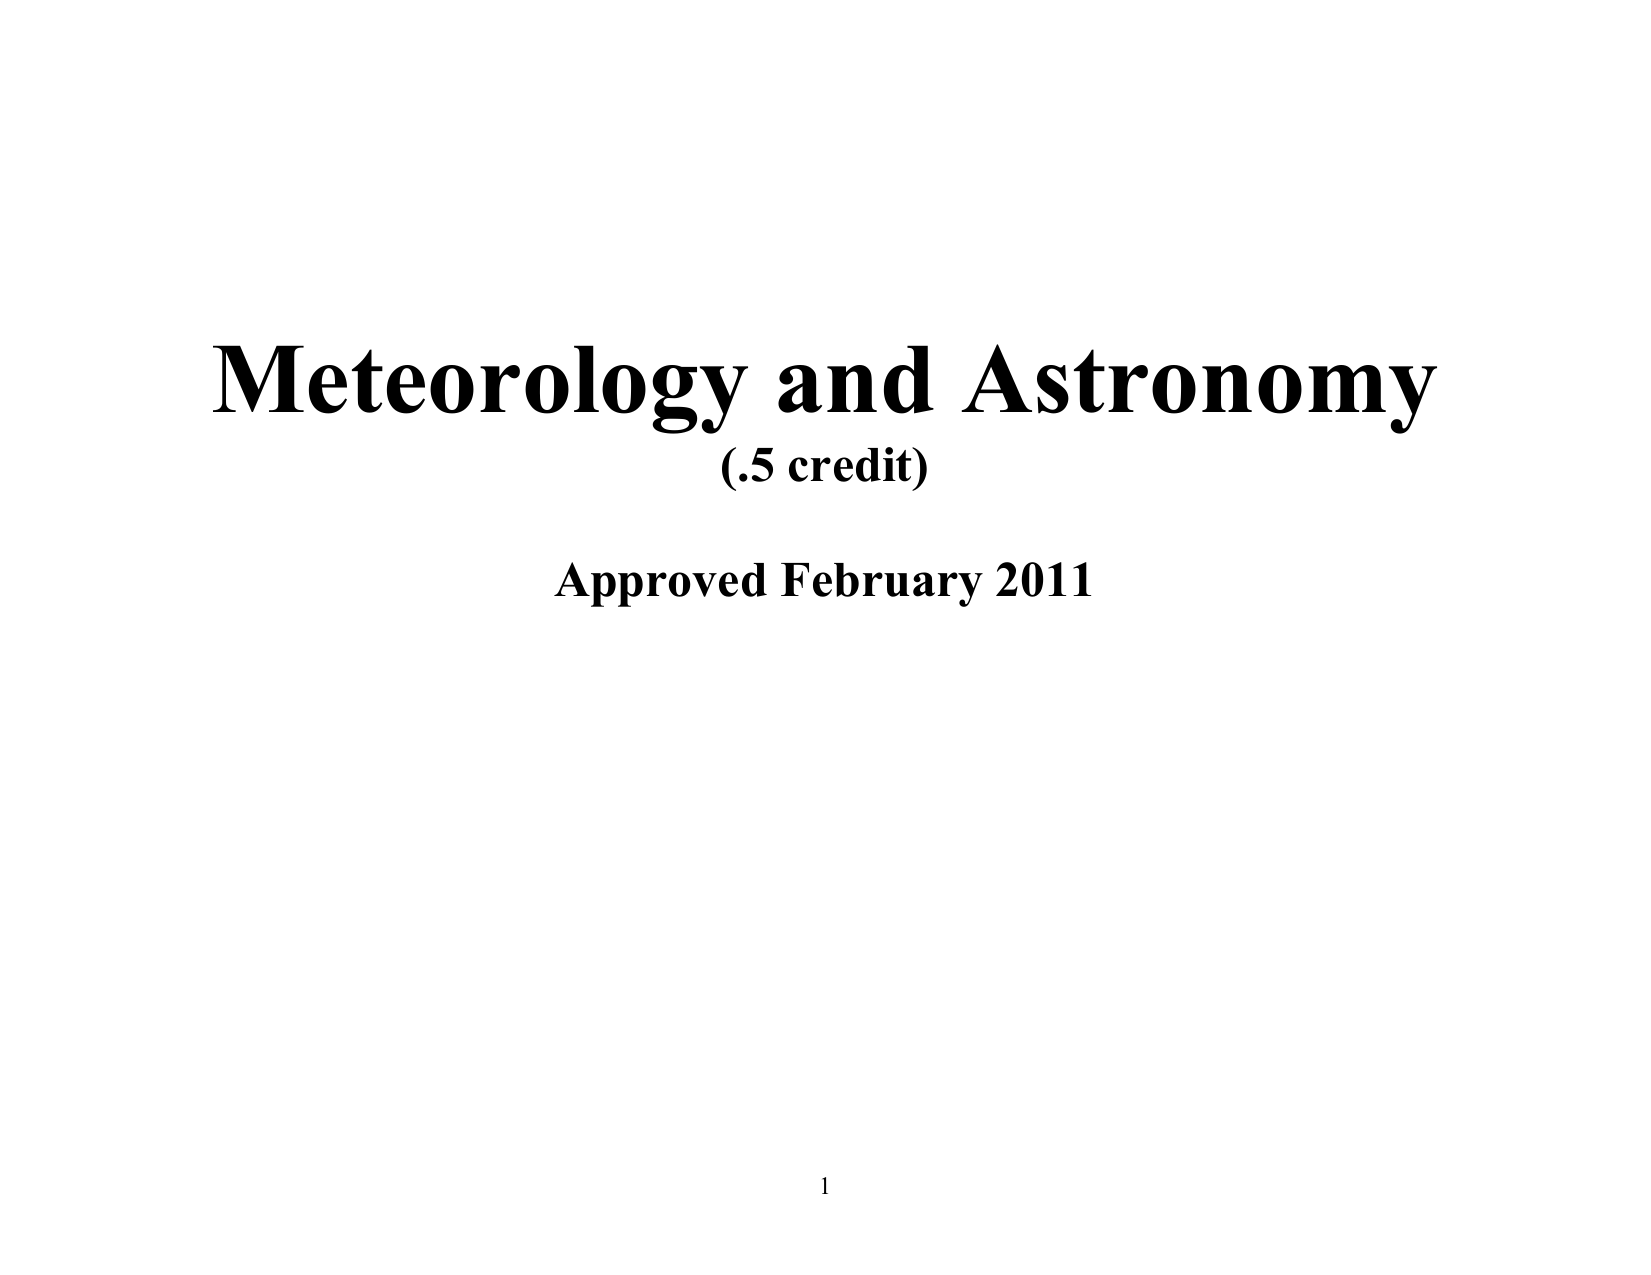 worksheet Stellar Evolution Worksheet meteorologyastronomy